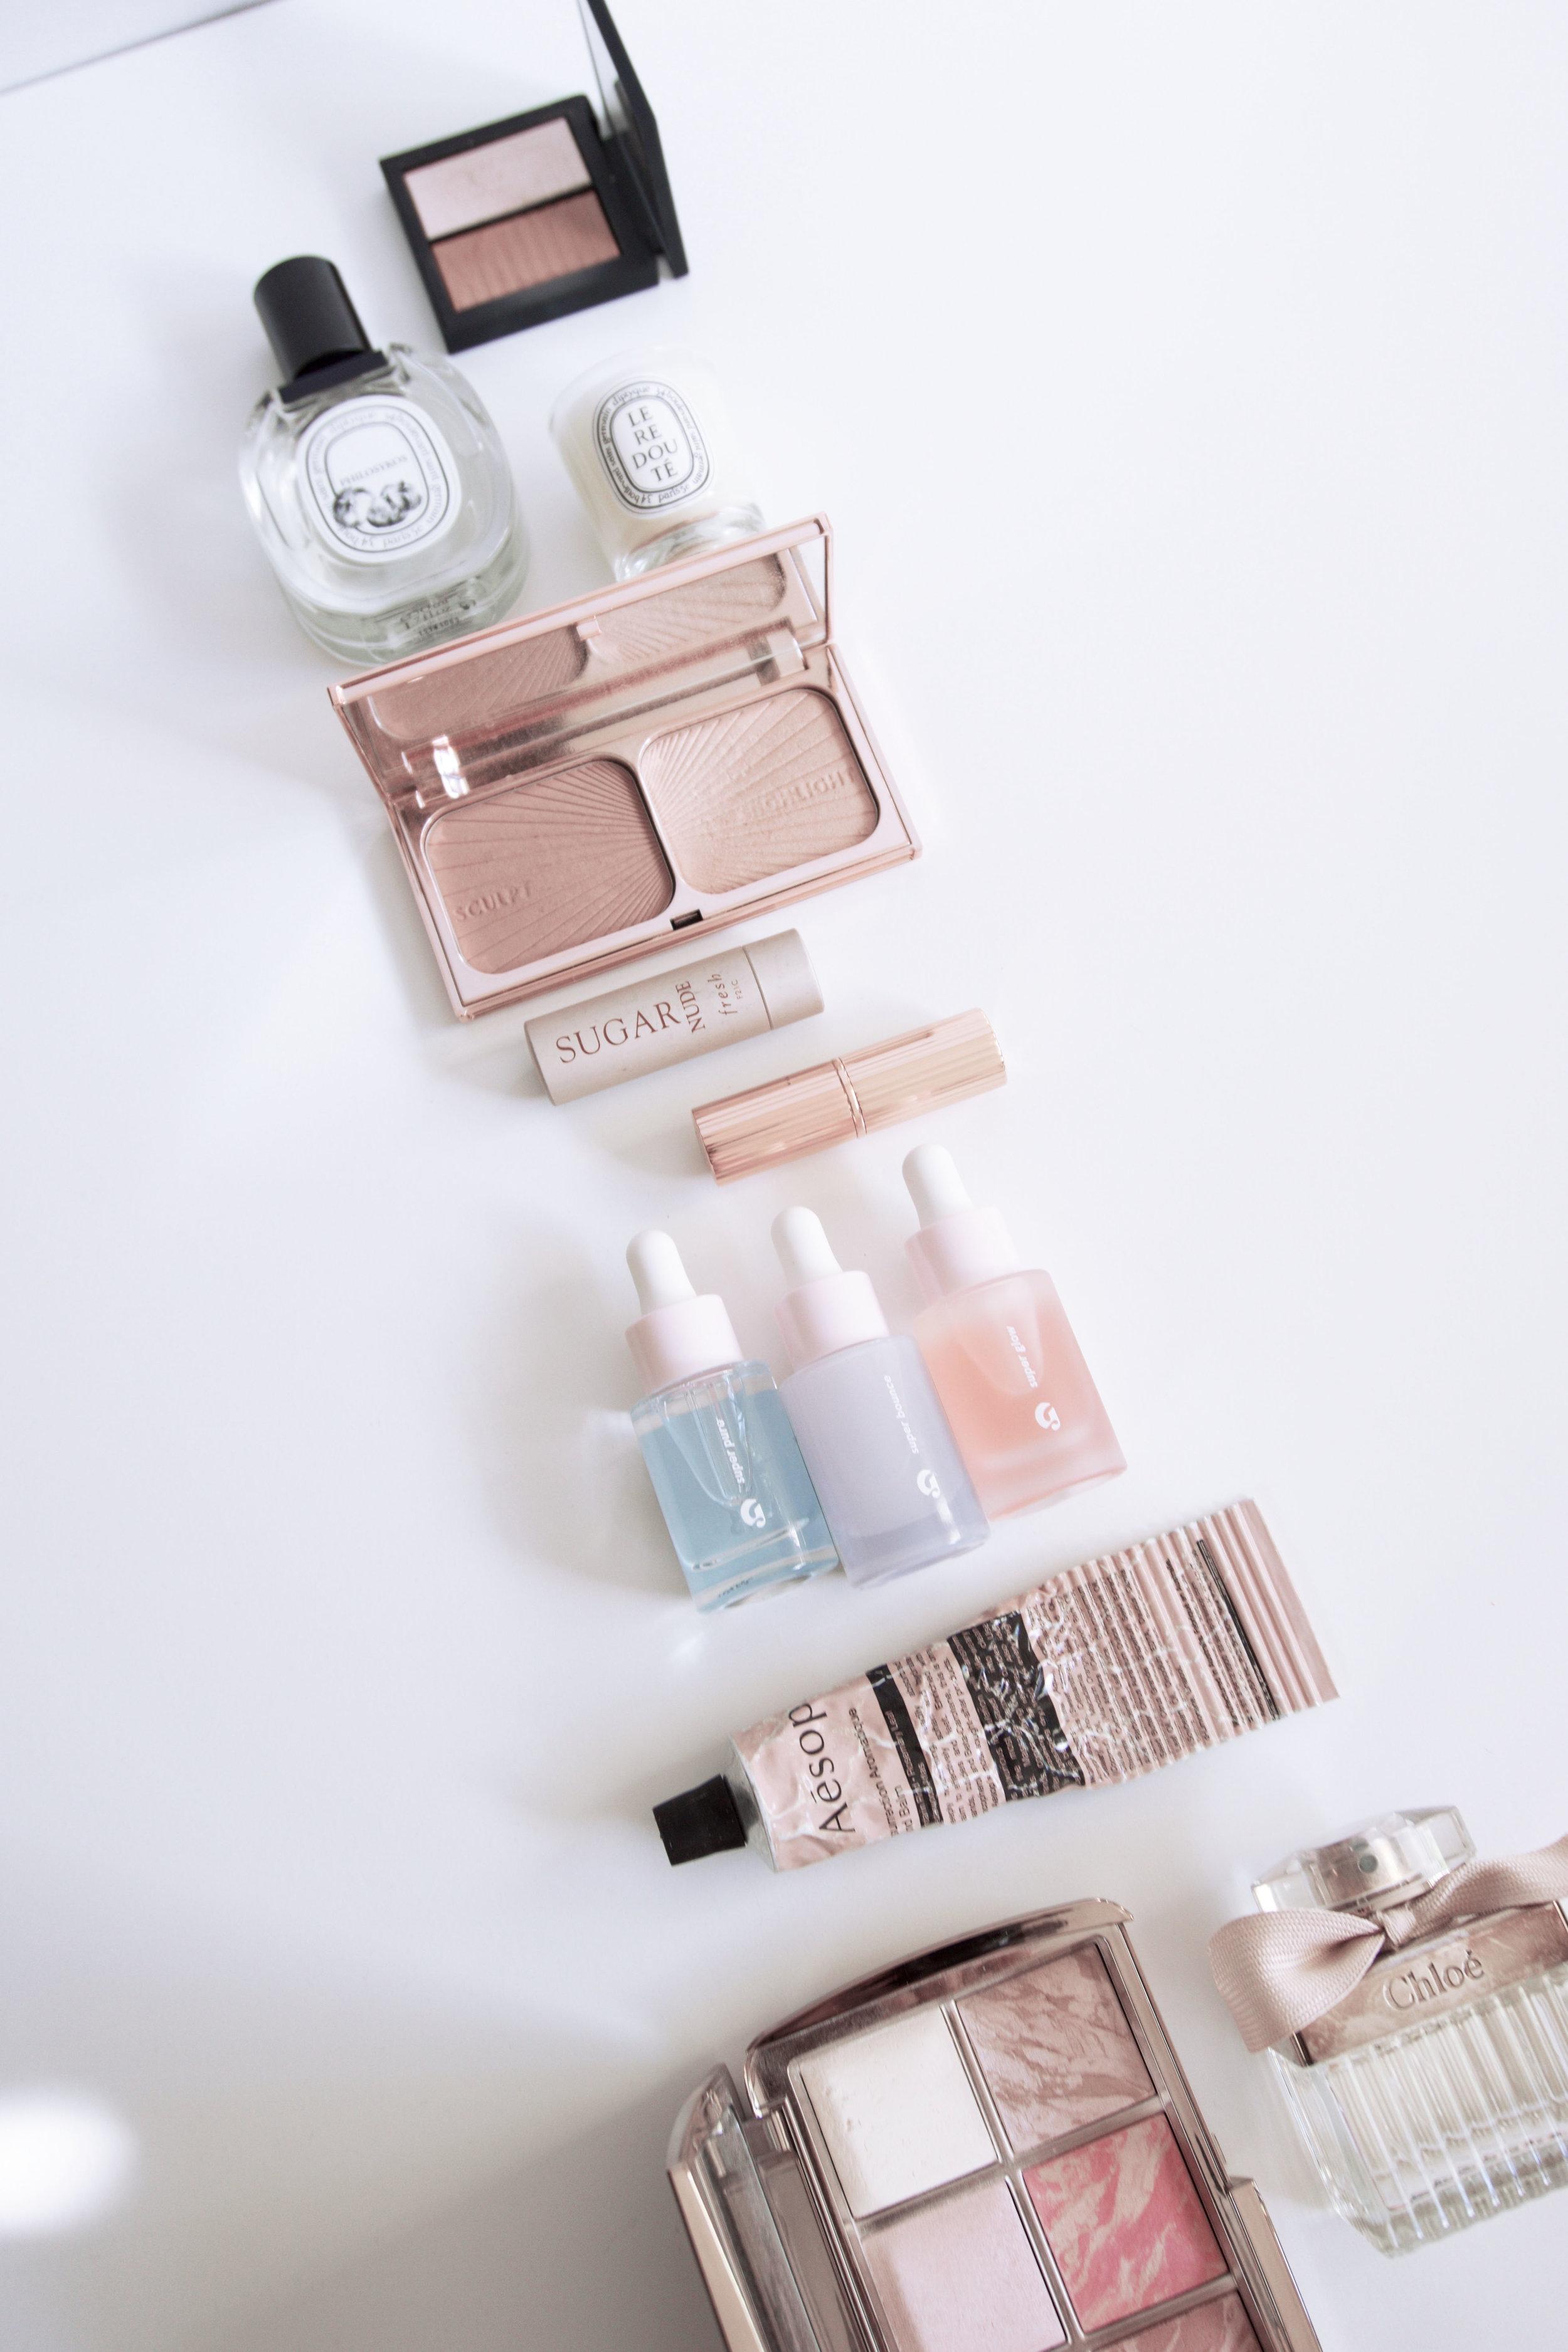 10-Prettiest-Beauty-Products-2